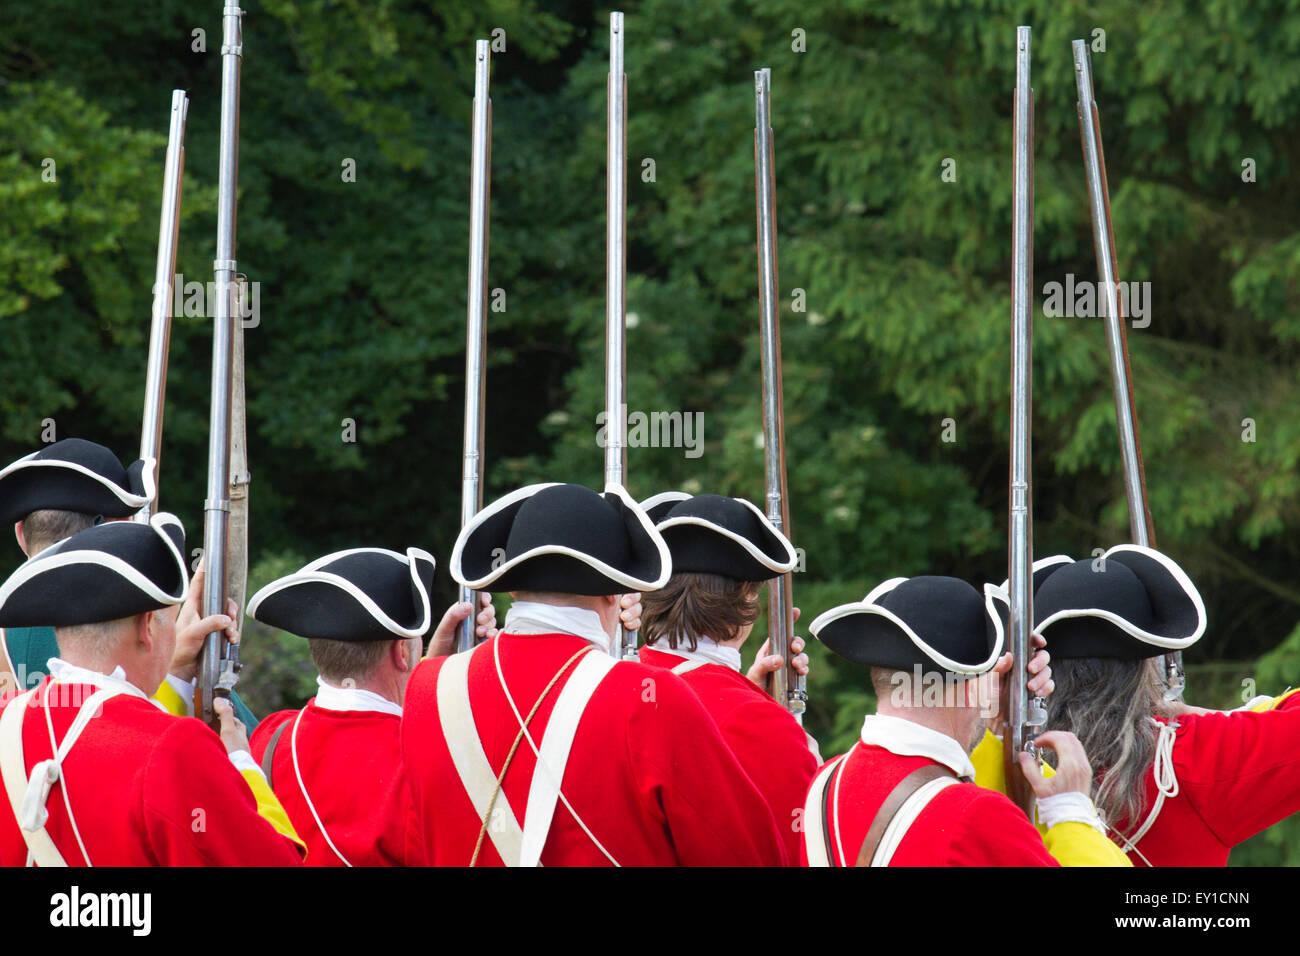 Hoghton Towers, Chorley, Lancashire, UK. 19th July, 2015.  English redcoat musketeers firing guns at the re-enactment Stock Photo